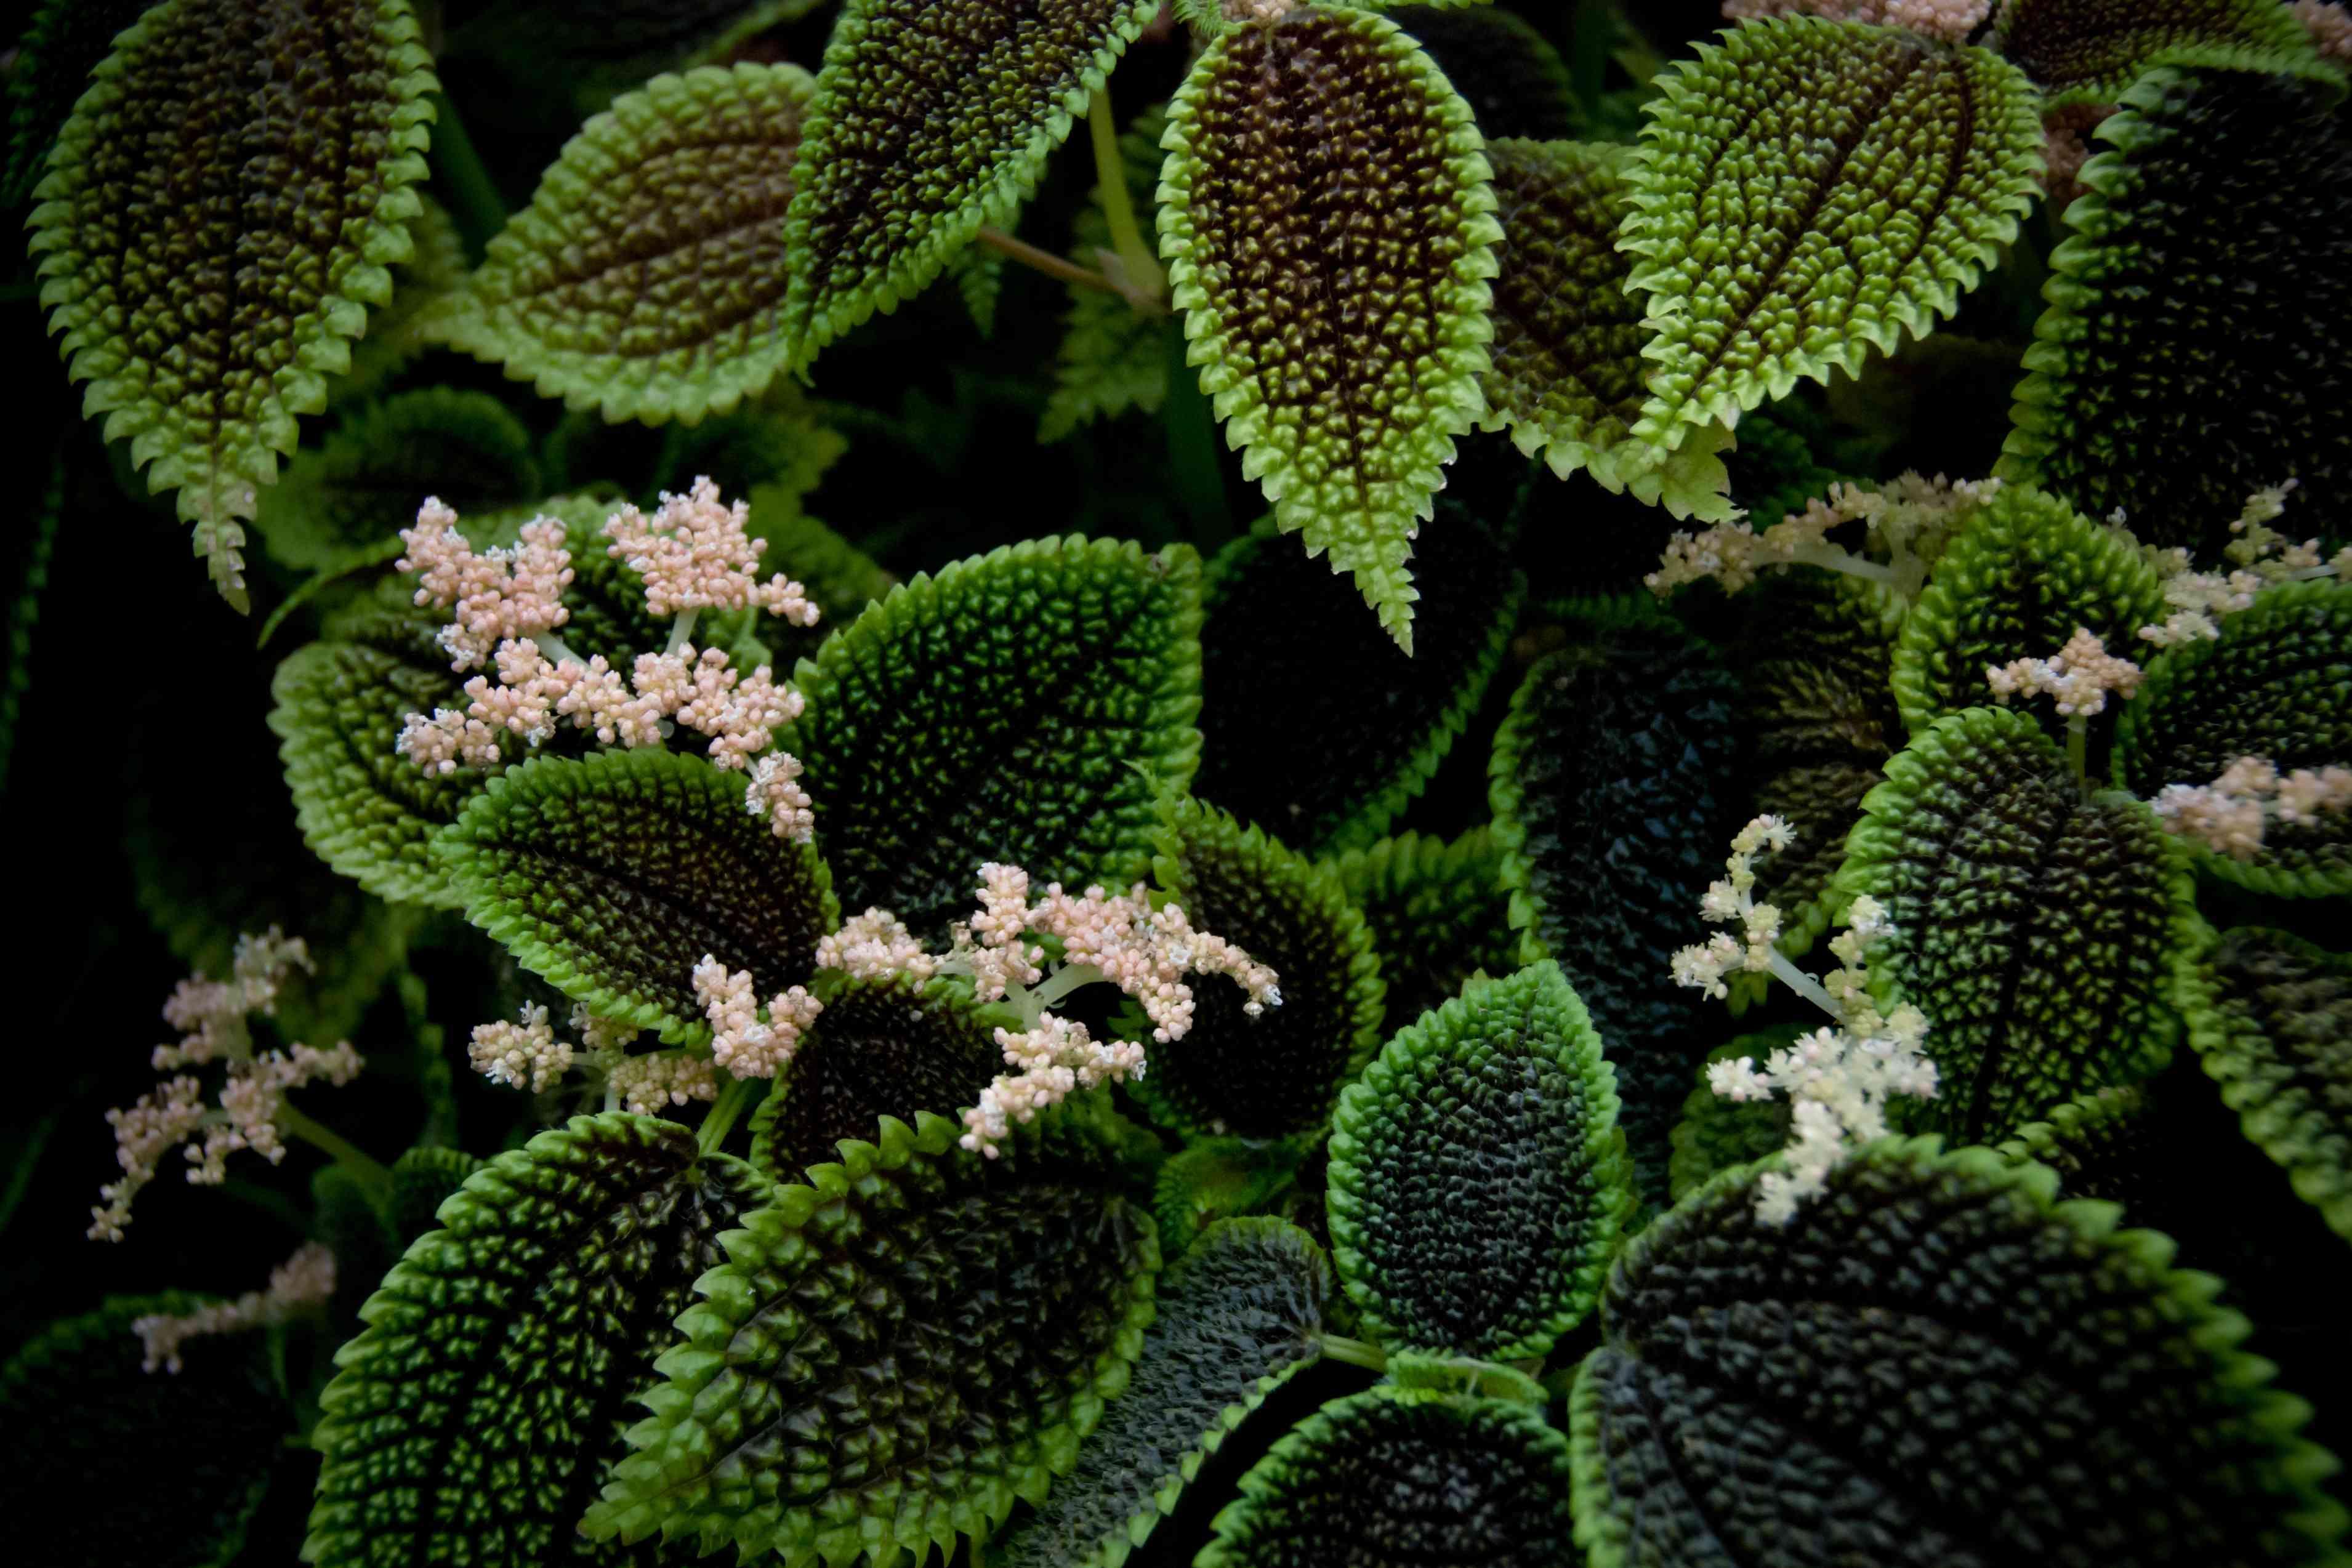 Friendship plant, Pilea involucrata, with blooms